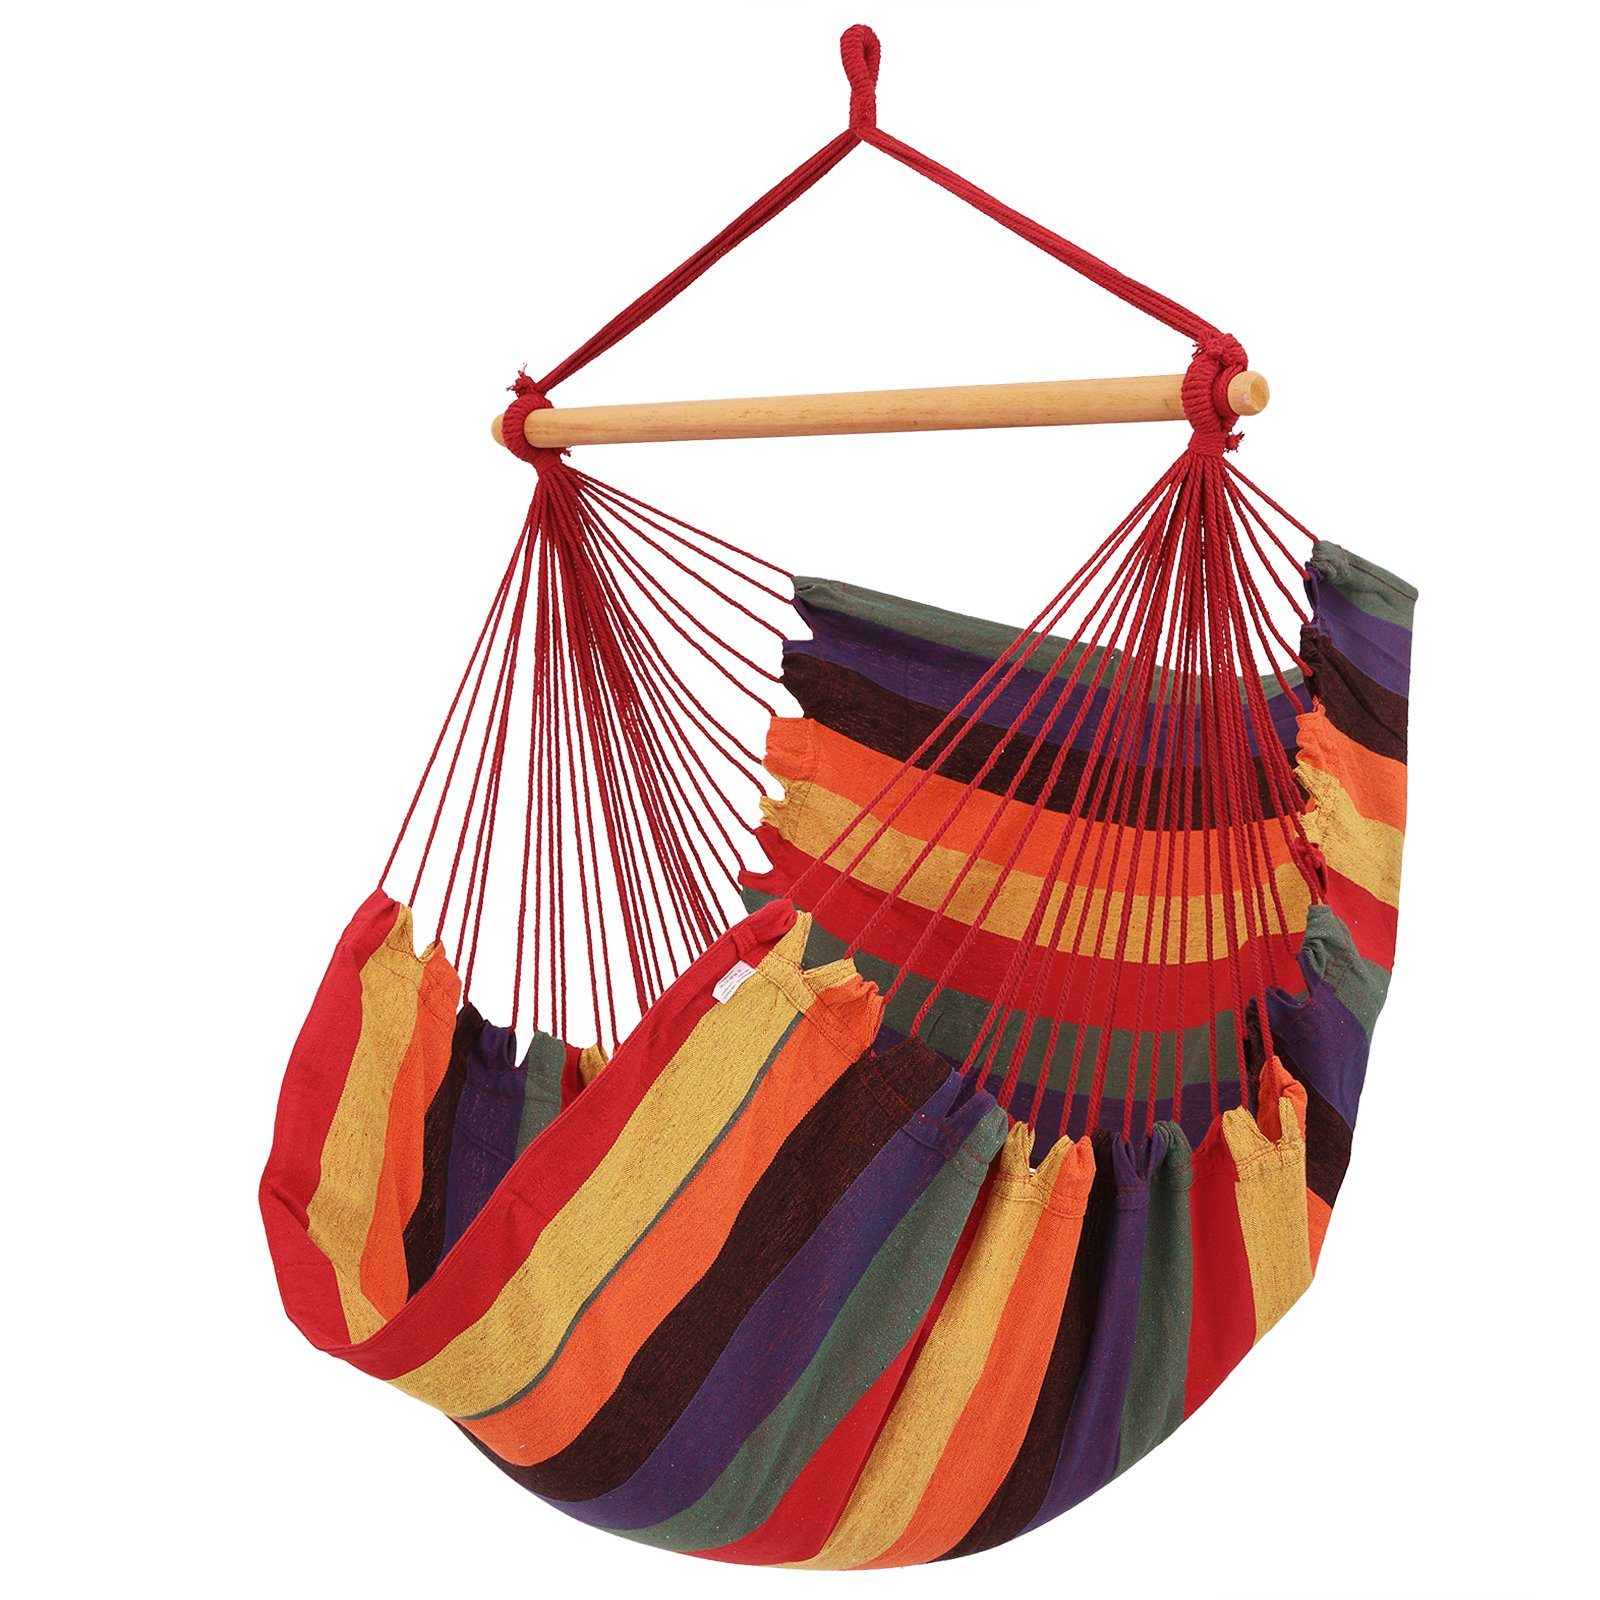 Songmics Hammock Hanging Swinging Cloth Chair Max 200 Kg Load 180 X 125 Cm Gdc185 Buy Online In Bulgaria At Desertcart Productid 48862021